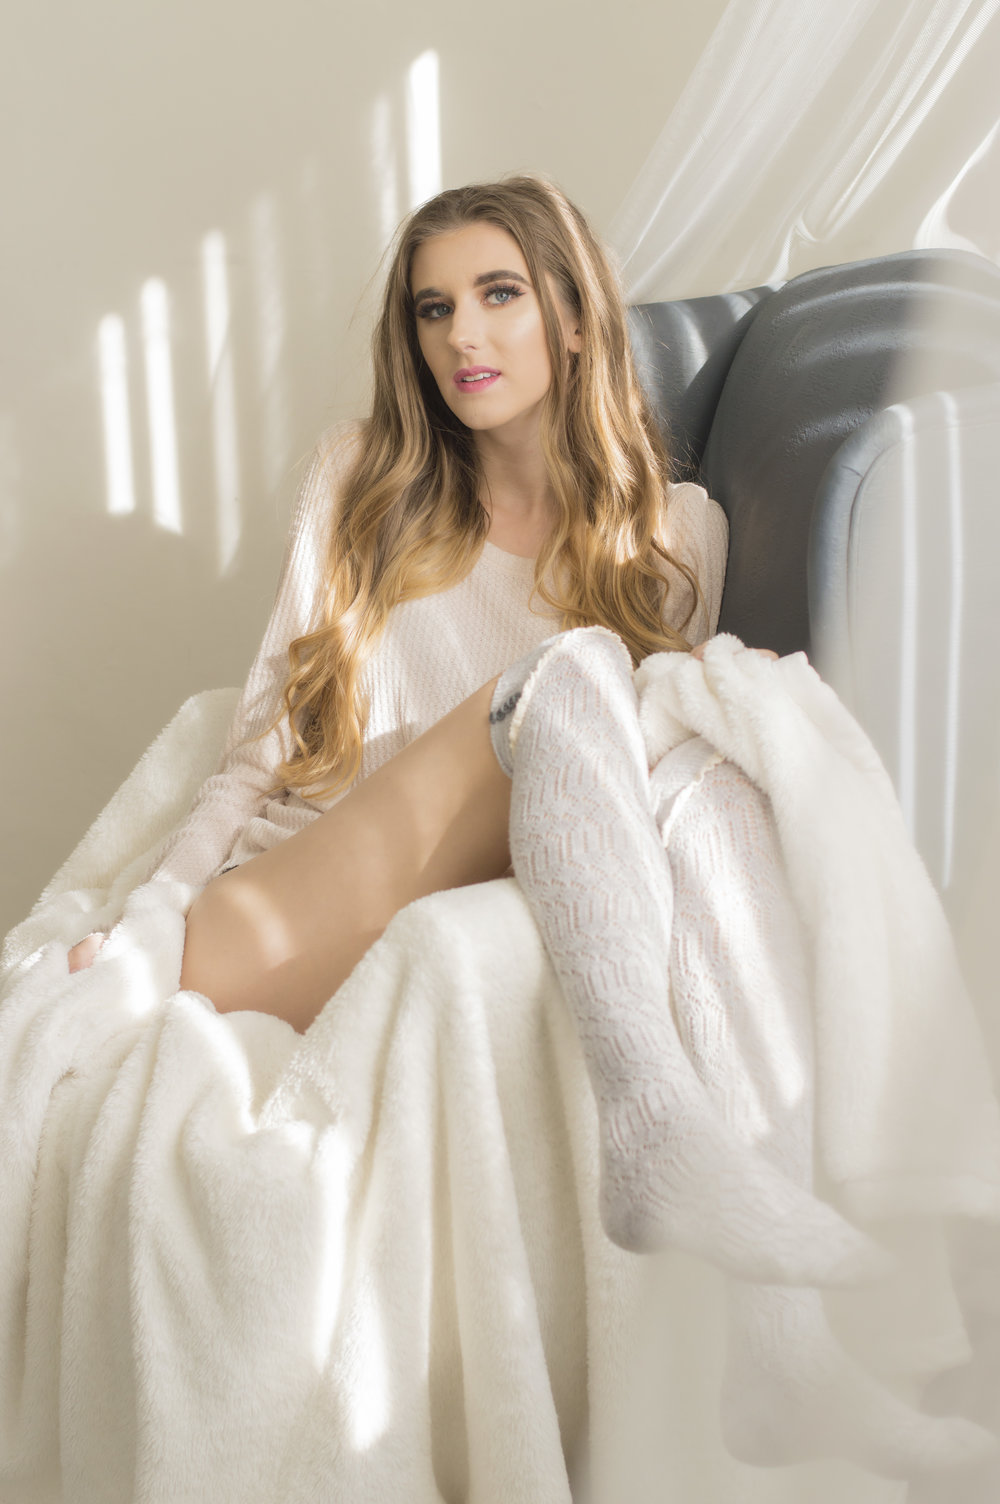 sexy-intimate-boudoir-photography-phoenix-scottsdale-mesa-gilbert-chandler-az-009